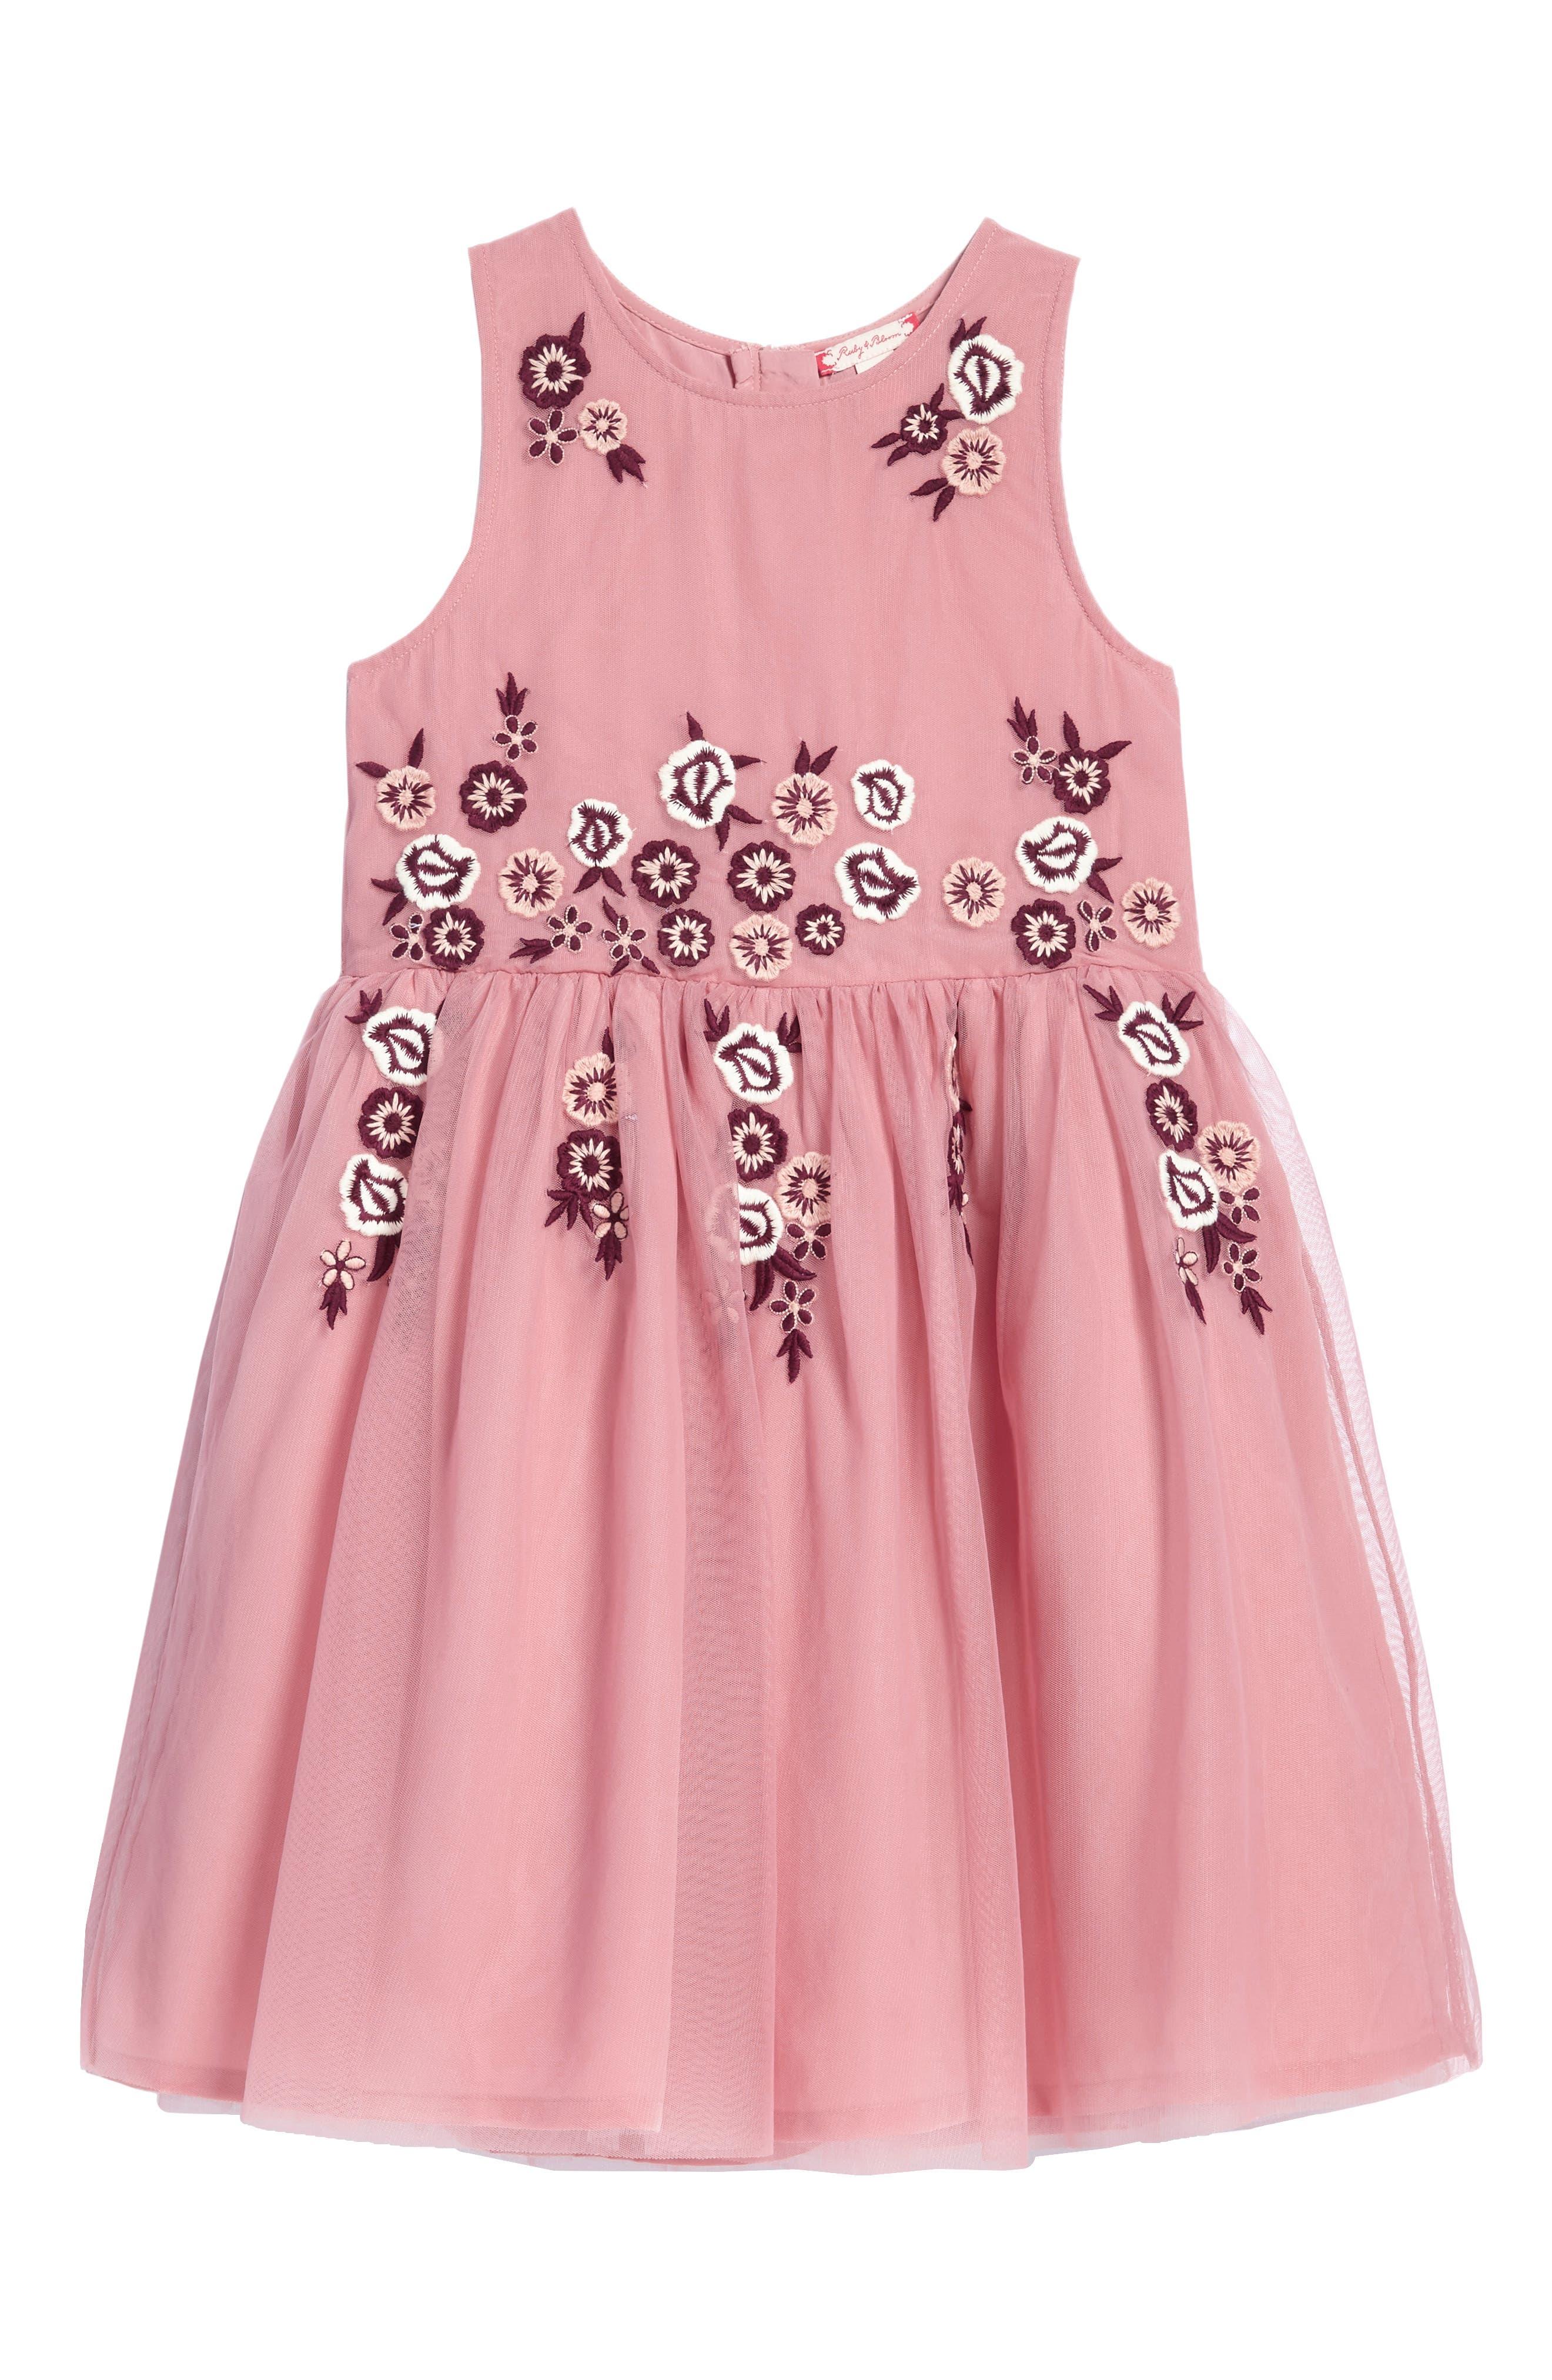 Main Image - Ruby & Bloom Flower Embroidered Dress (Toddler Girls, Little Girls & Big Girls)